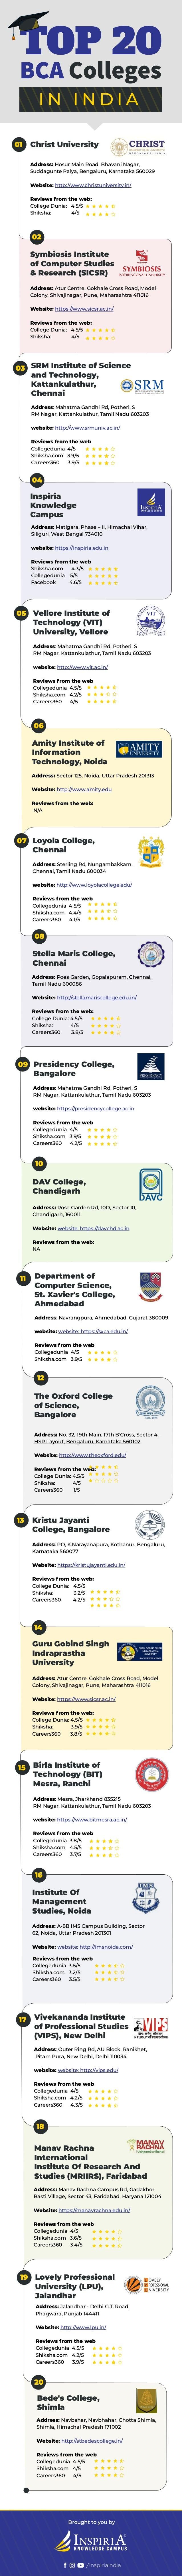 TOP 20 I N I N D I A Christ University Address: Hosur Main Road, Bhavani Nagar, Suddagunte Palya, Bengaluru, Karnataka 560...